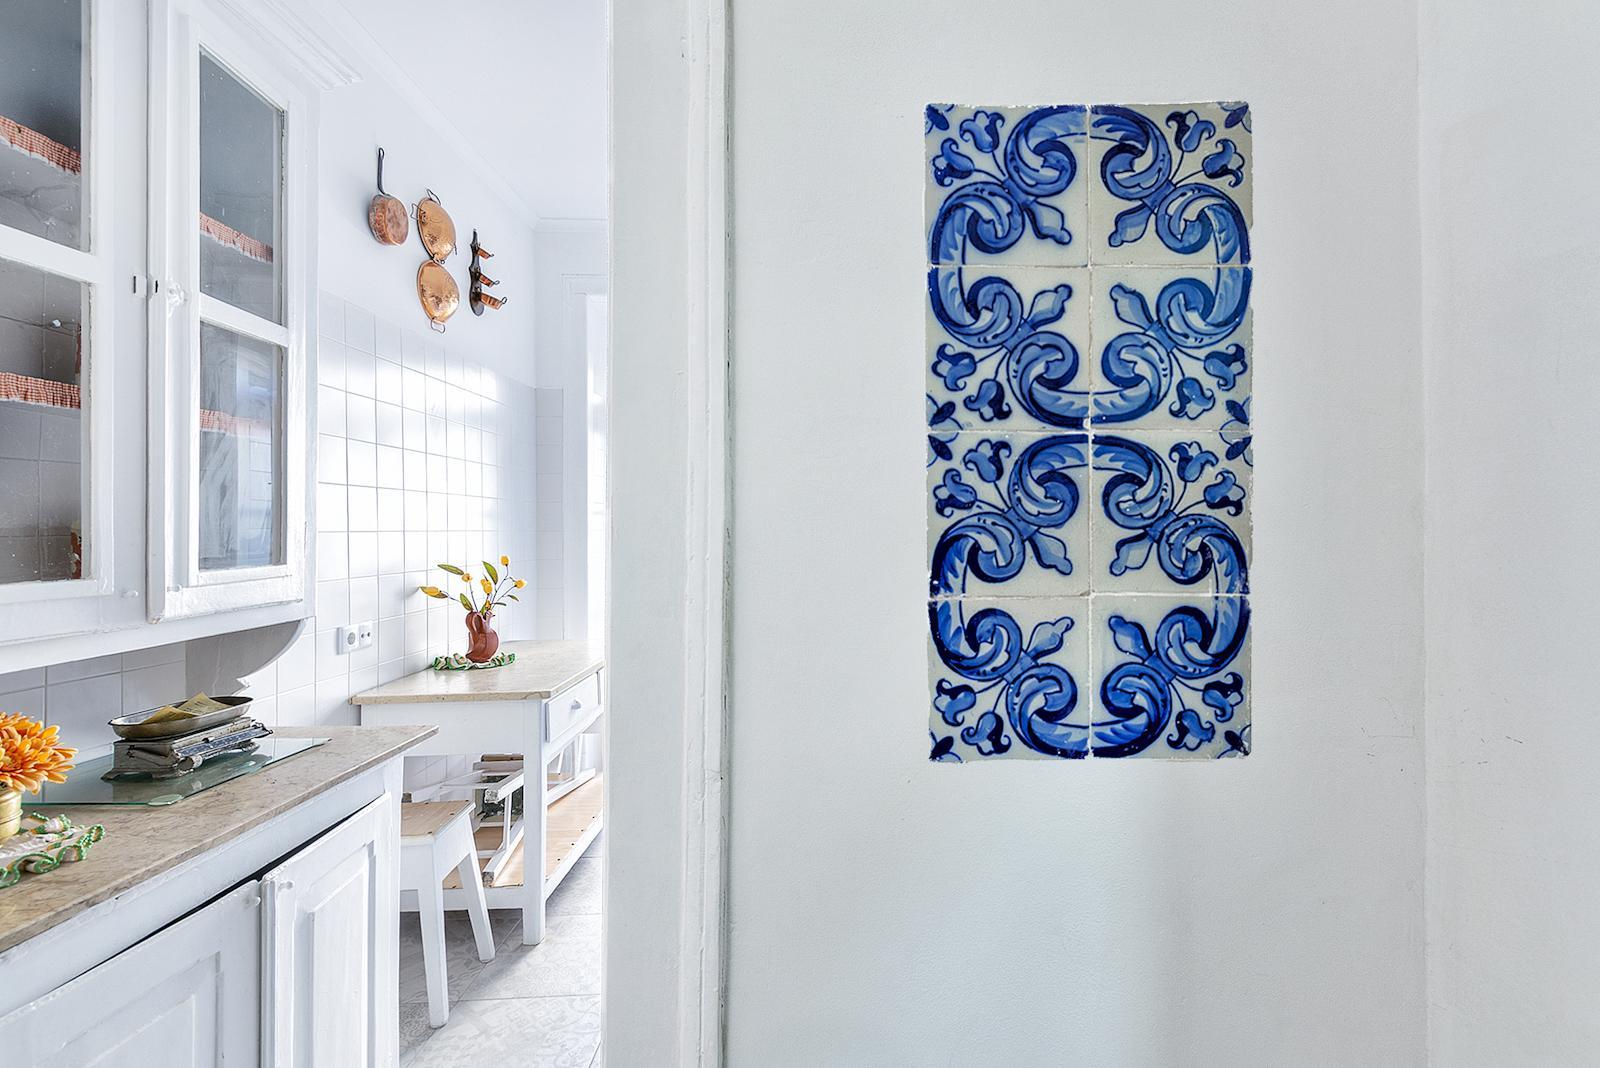 Bombarda - Shared 5 bedroom flat in Lisbon